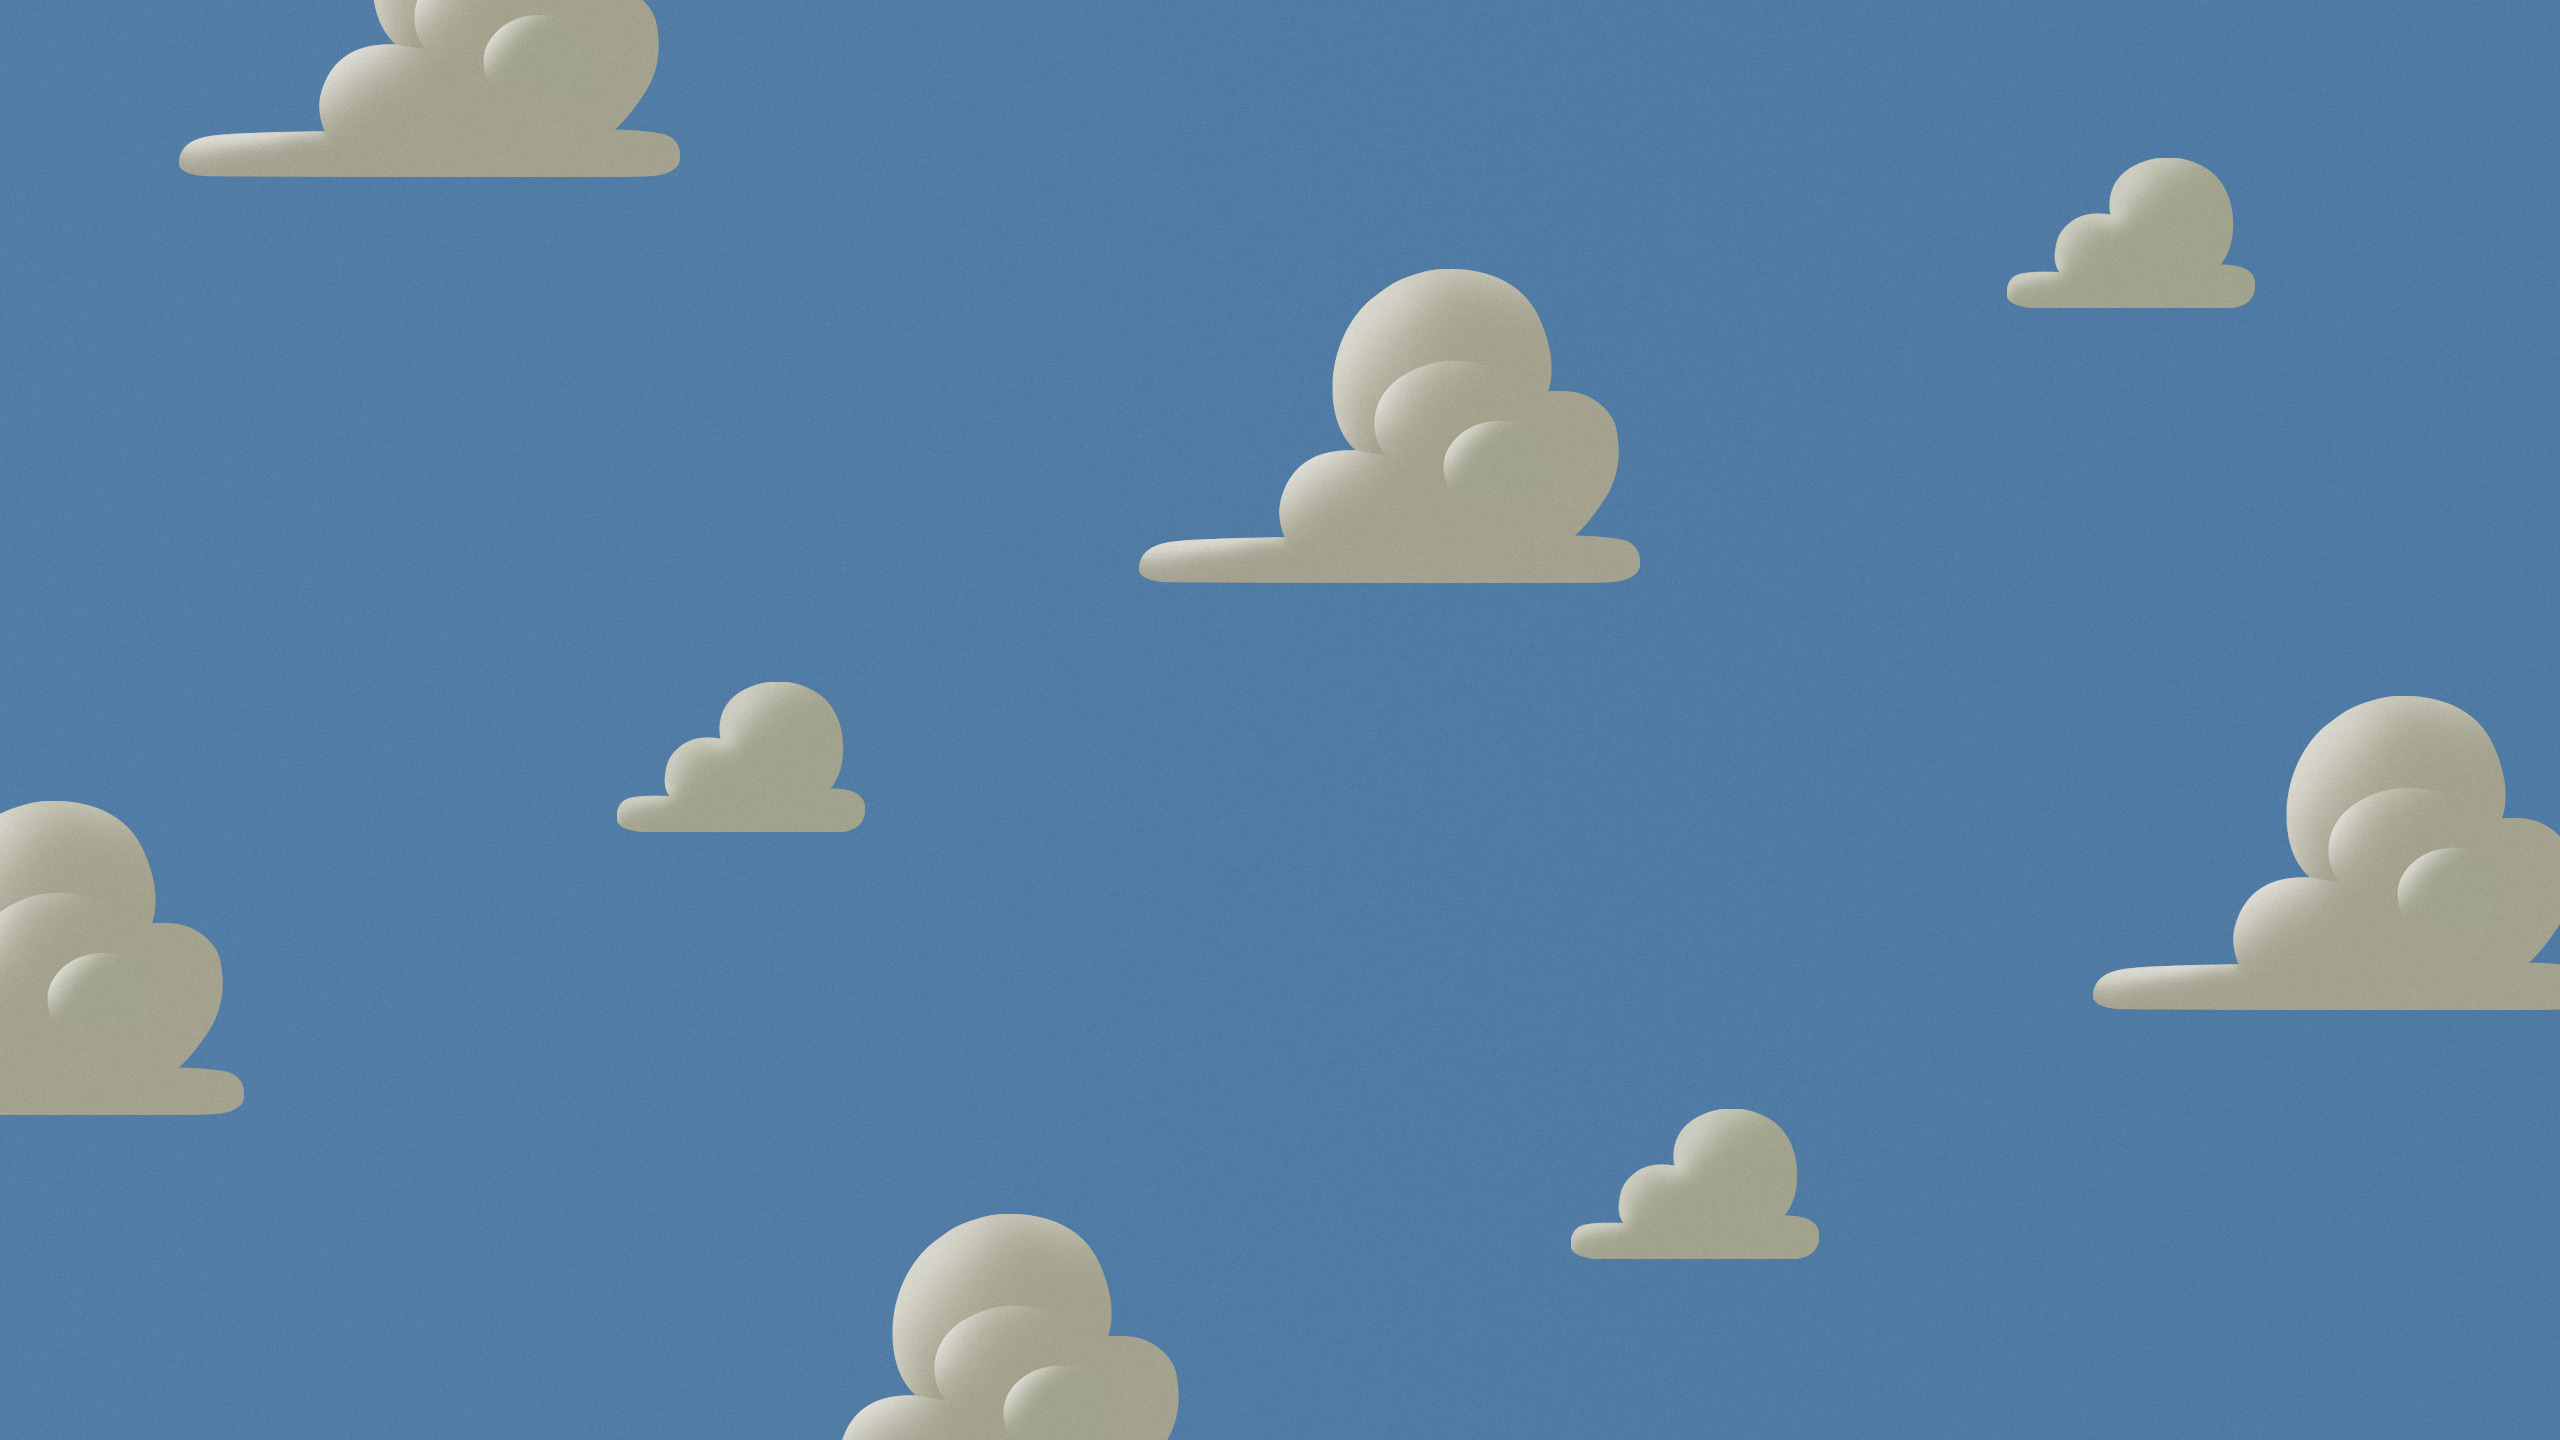 Andy S Wallpaper Toy Story Wallpapersafari